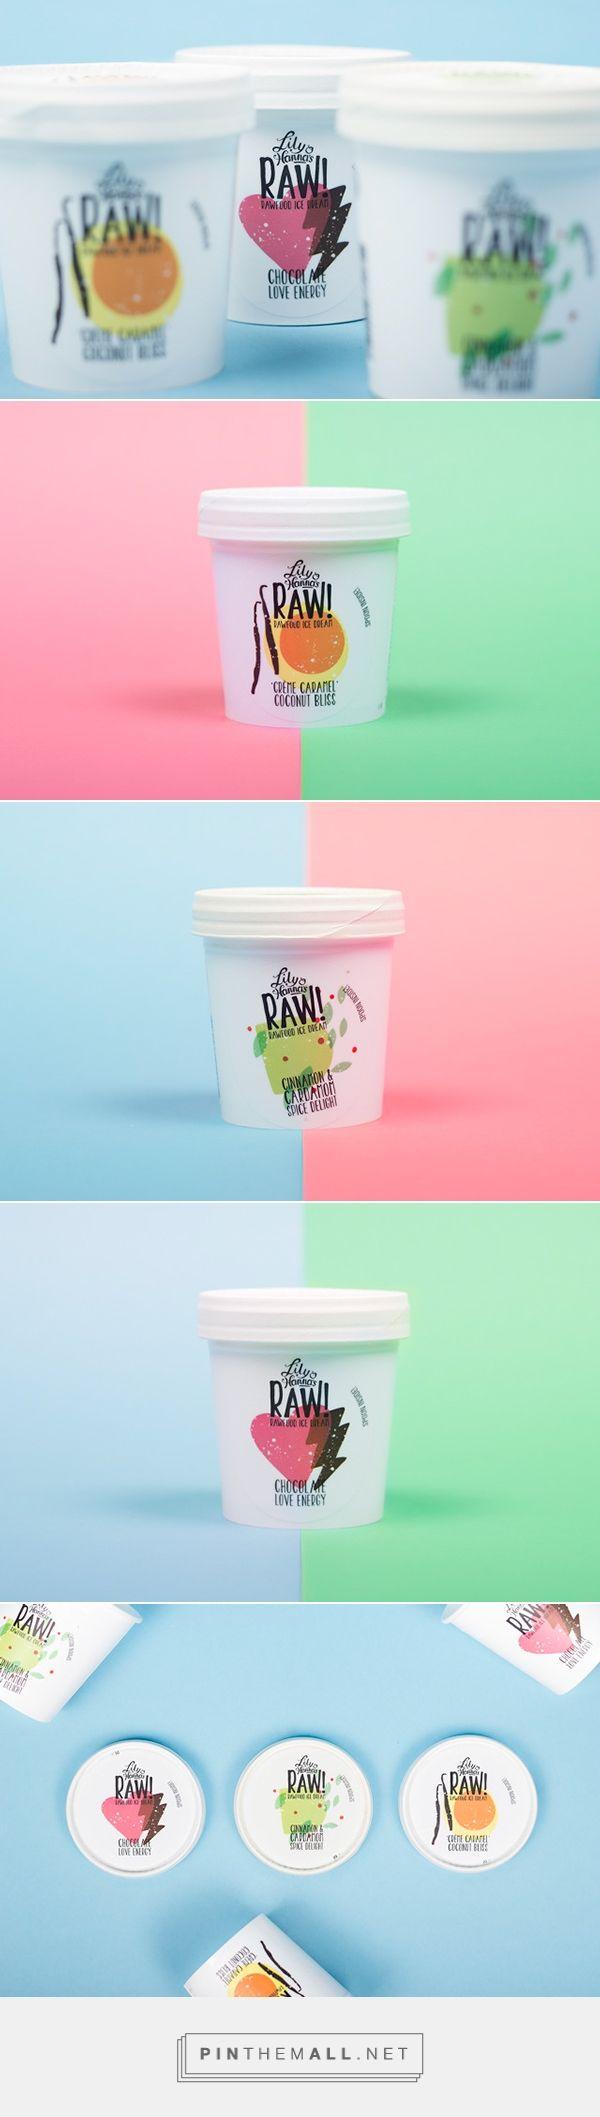 Lilly O Hanna's RAW! // Packaging design for RAW!, a Swedish rawfood ice'dream' brand.